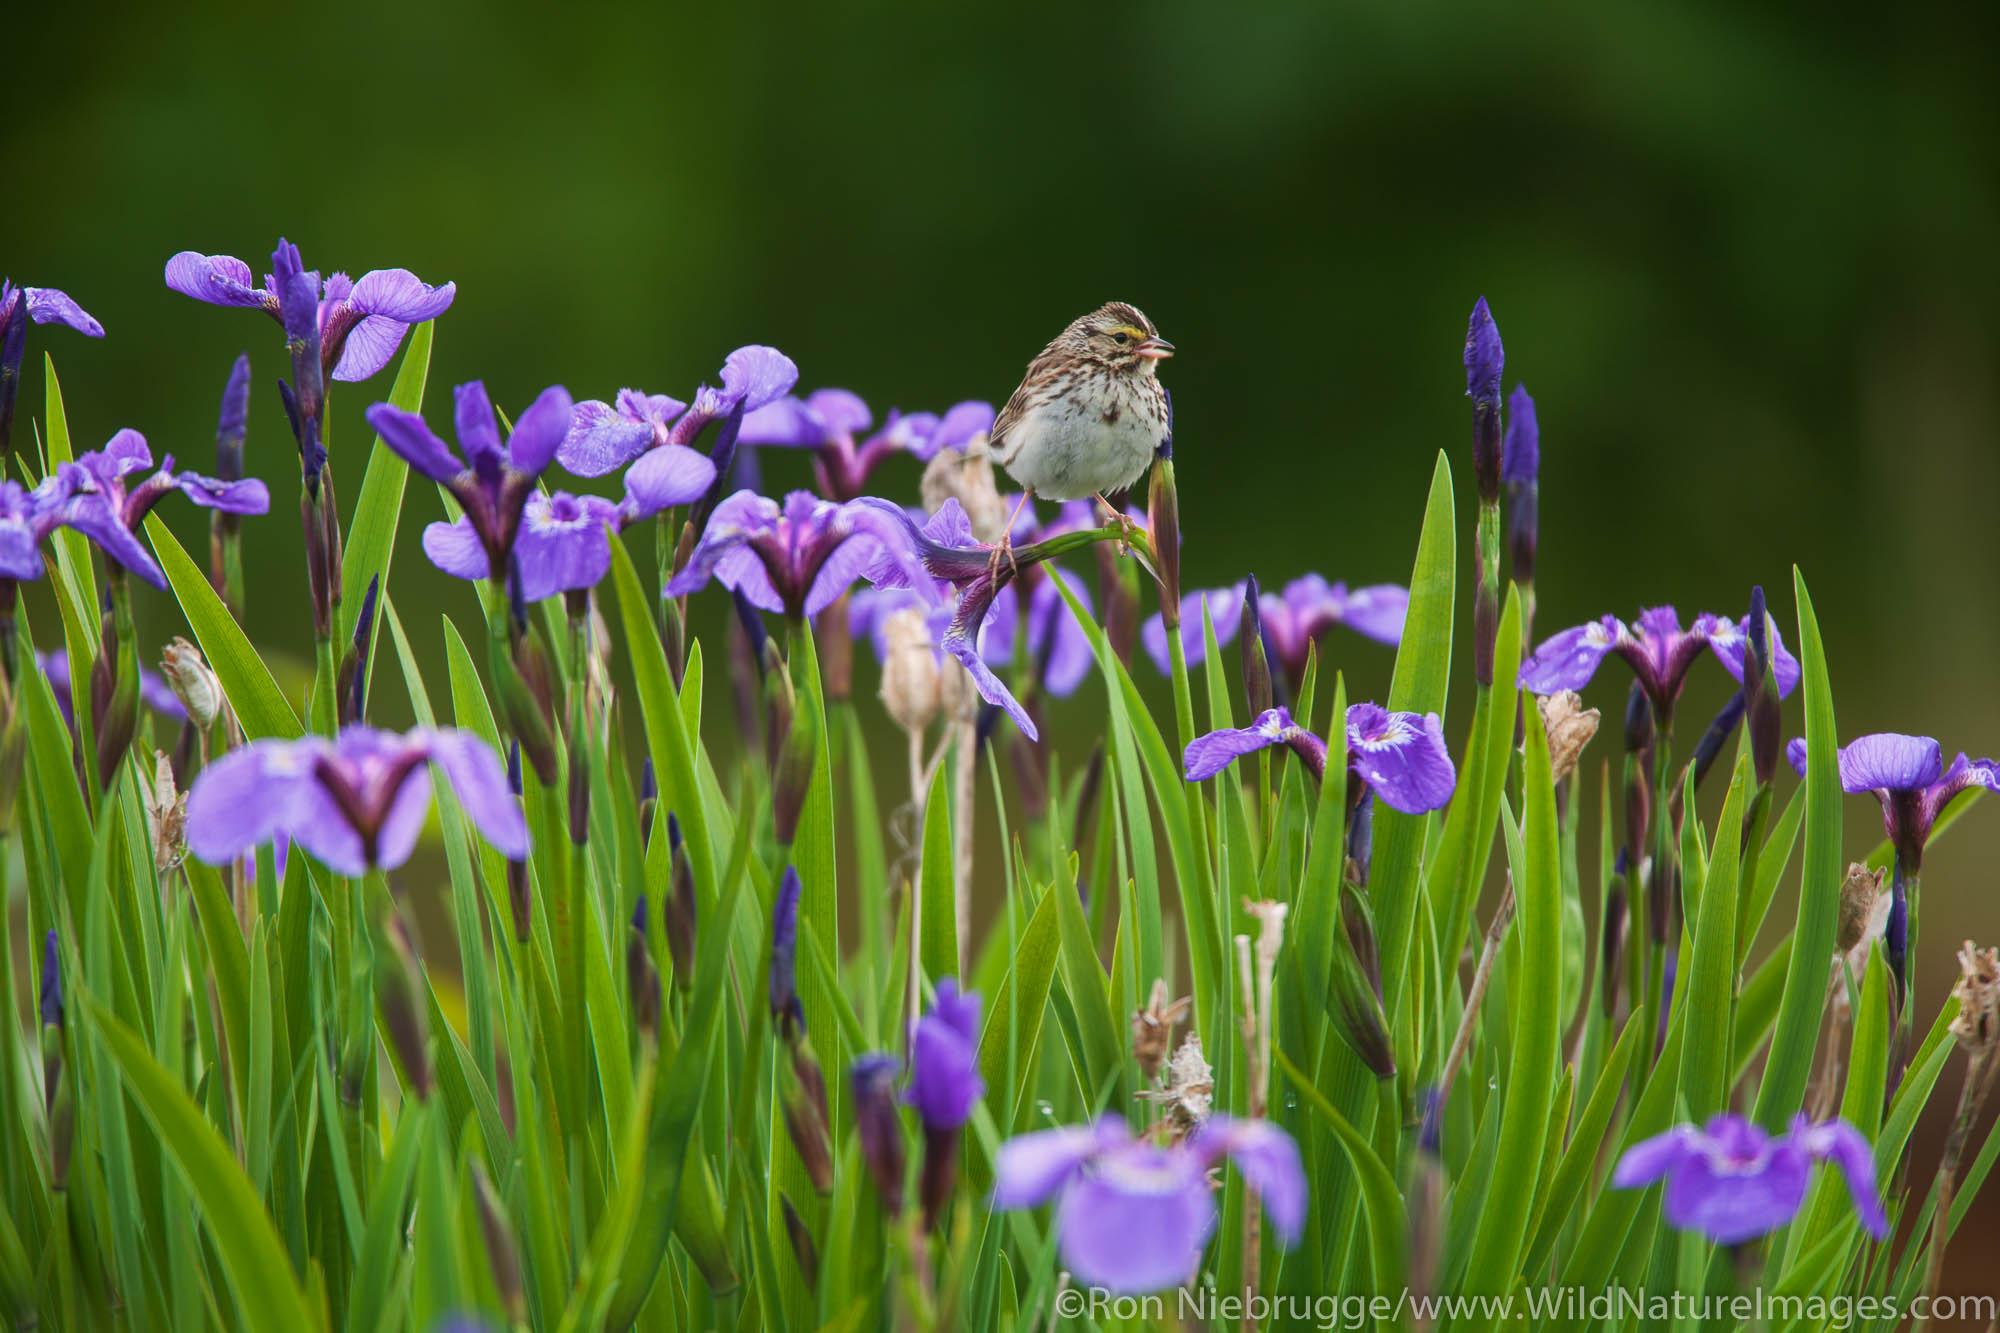 Savannah Sparrow (Passerculus sandwichensis) on wild iris, Chugach National Forest, Alaska.